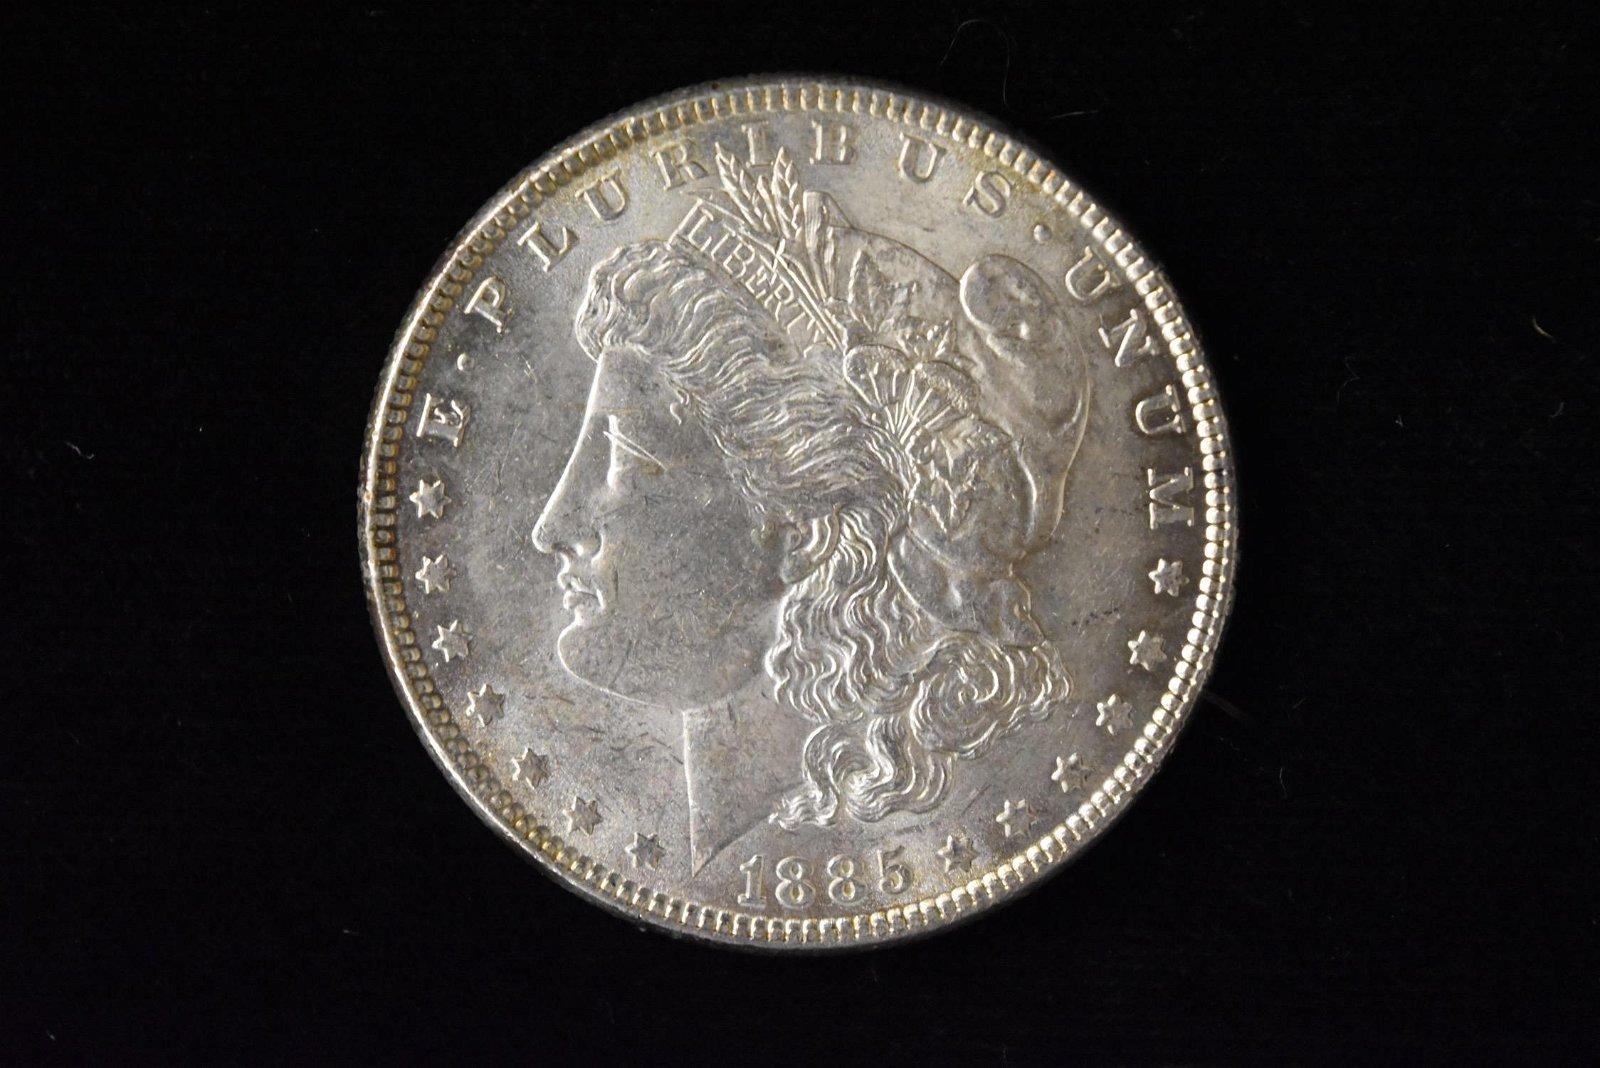 1885 High Grade Morgan Silver Dollar Grade By Picture.